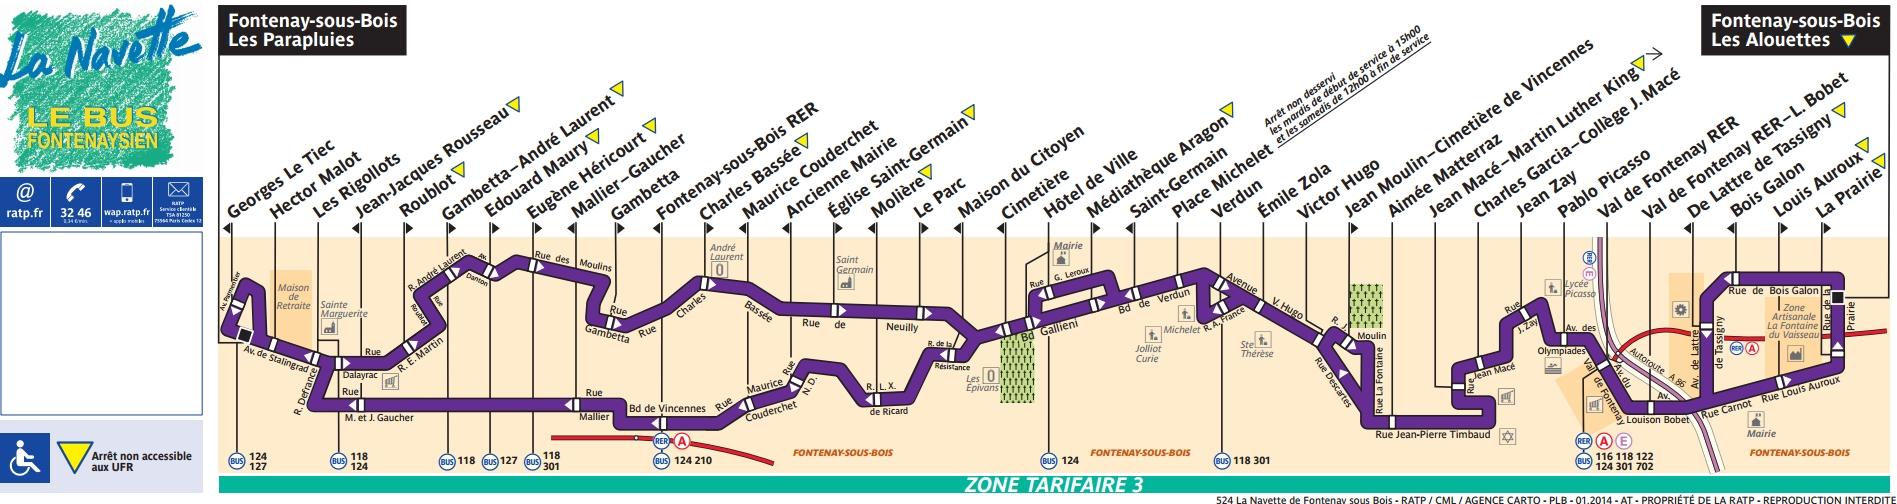 Plan bus Ligne 524